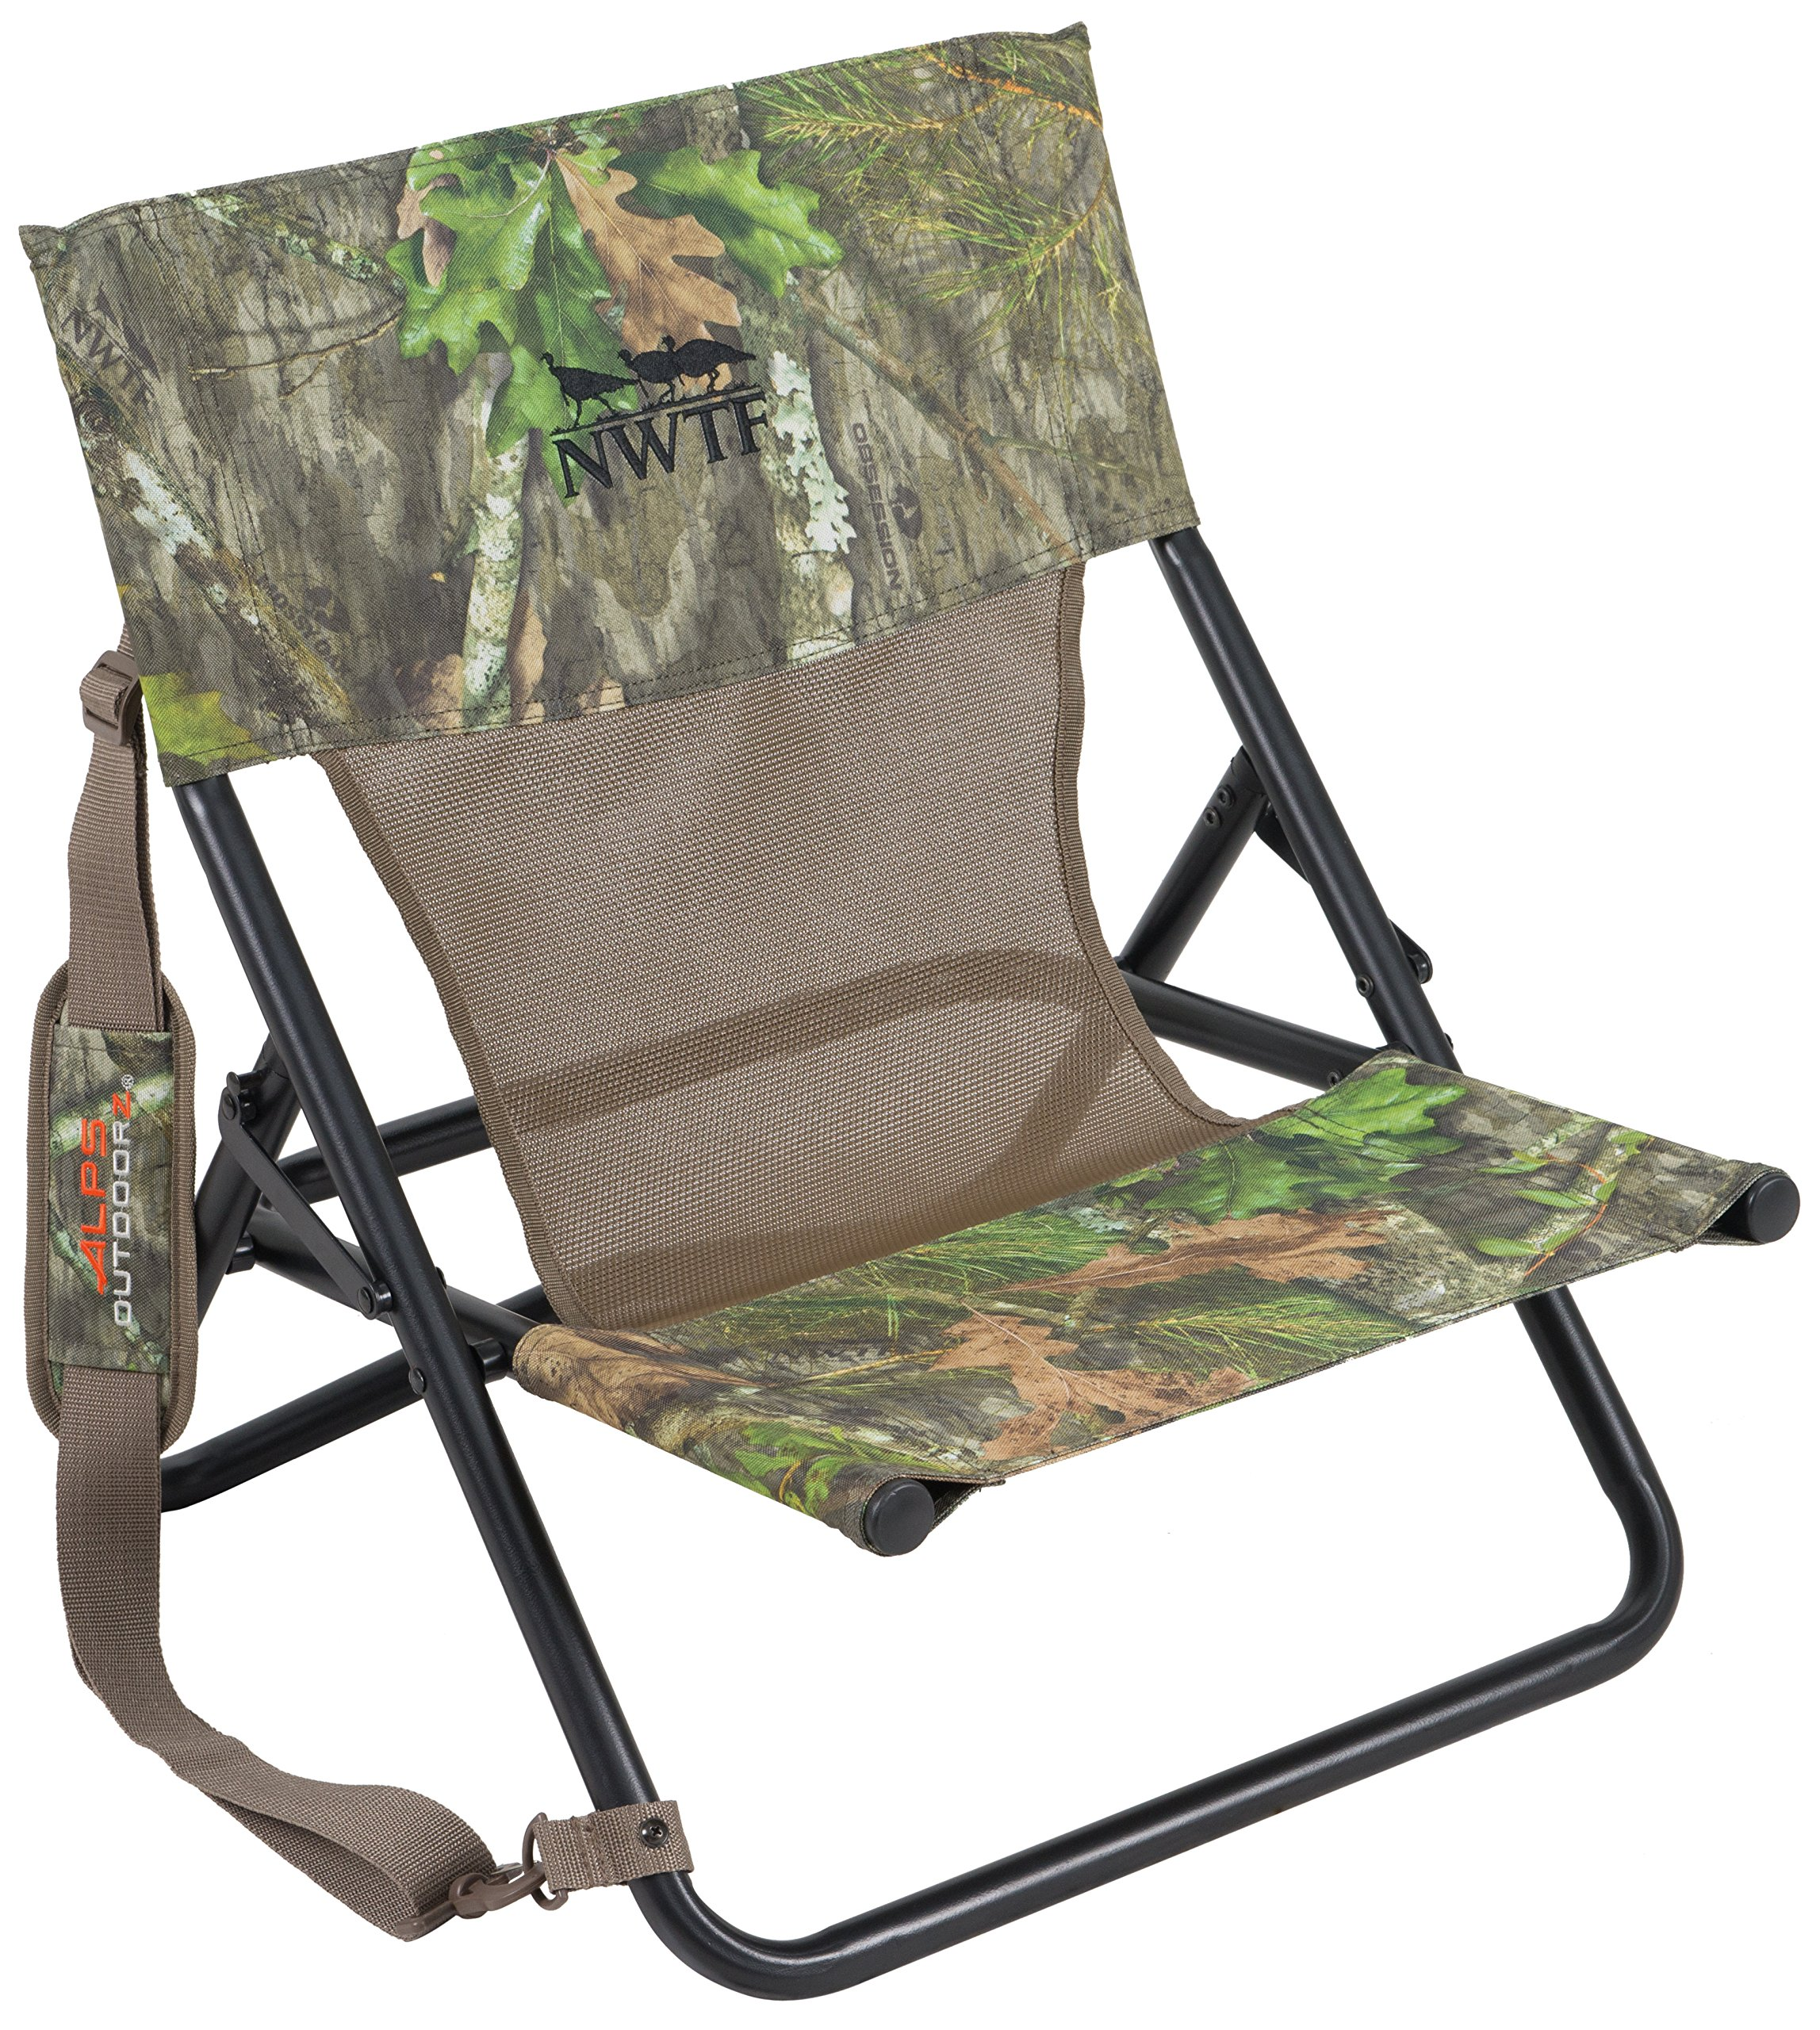 ALPS OutdoorZ NWTF Turkey Hunting Chair